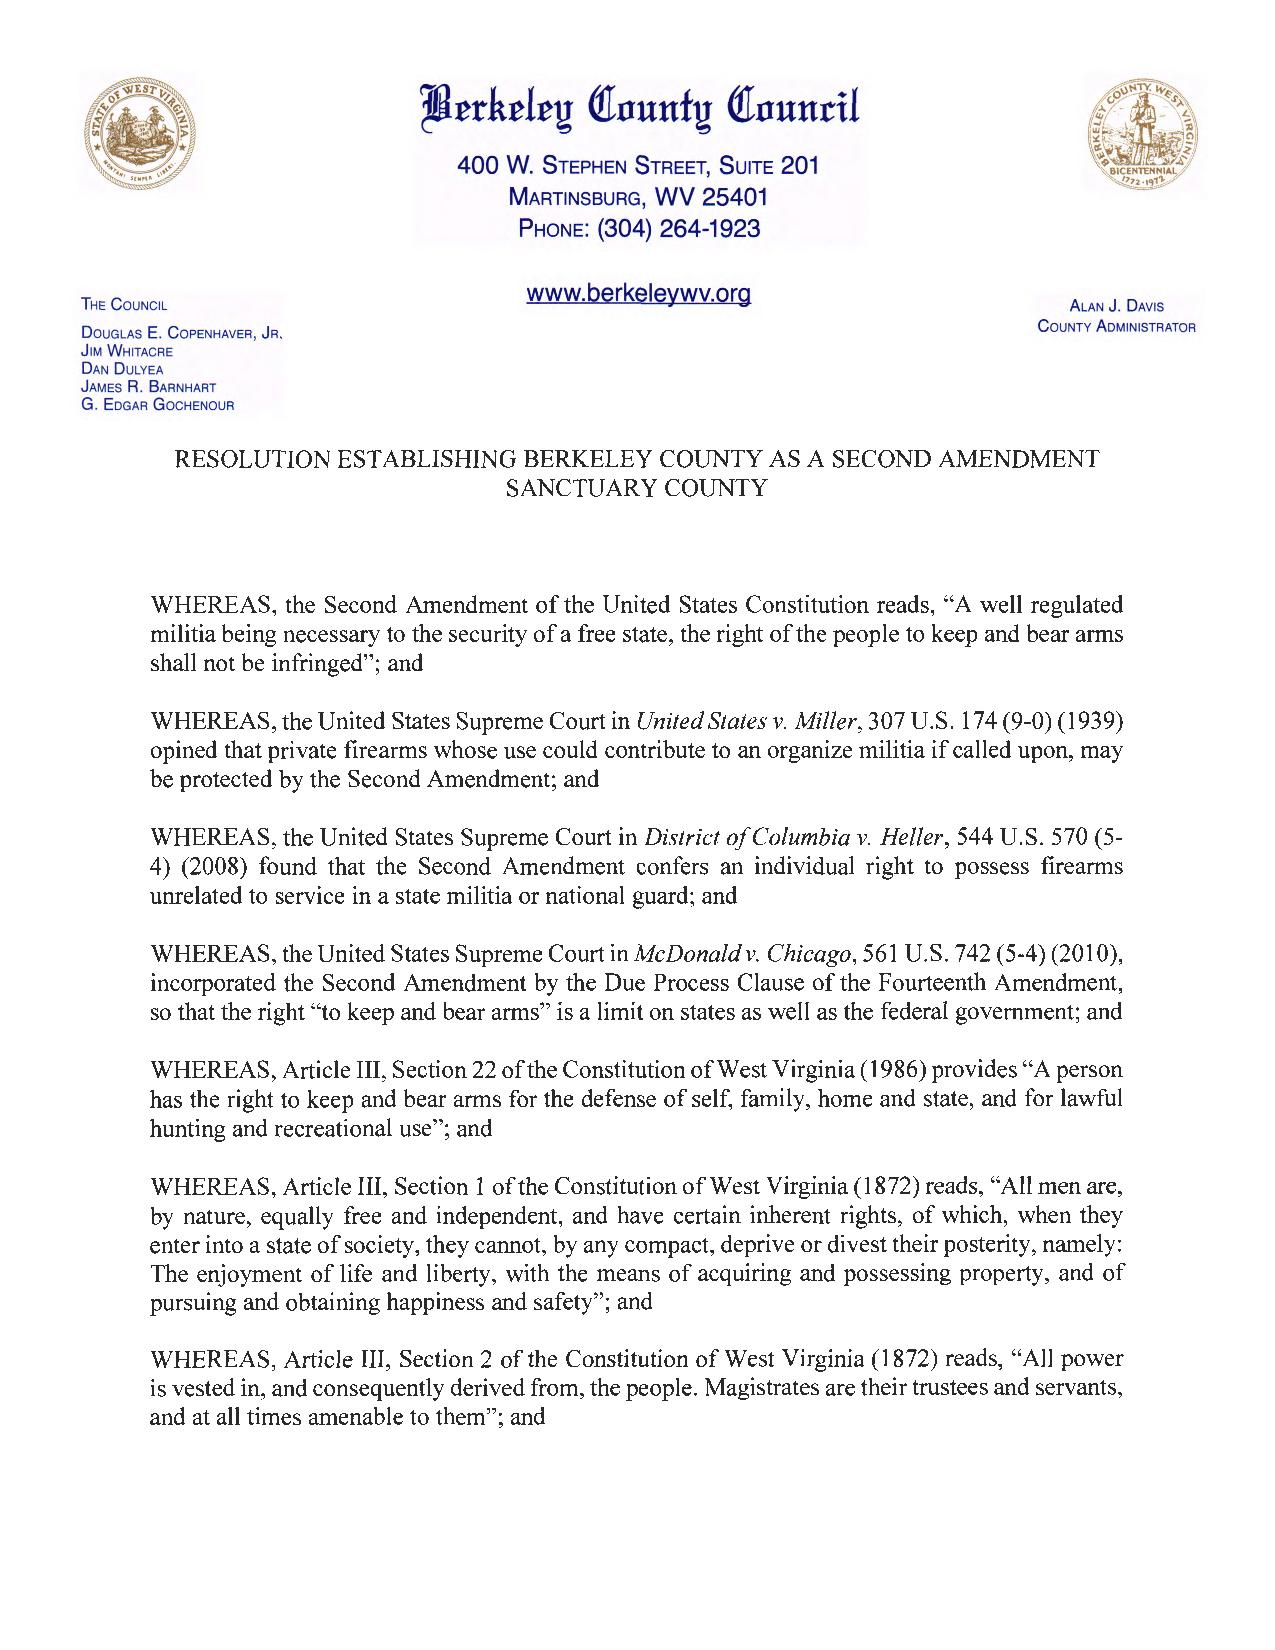 Berkley County West Virginia Second Amendment Sanctuary Resolution Page 1